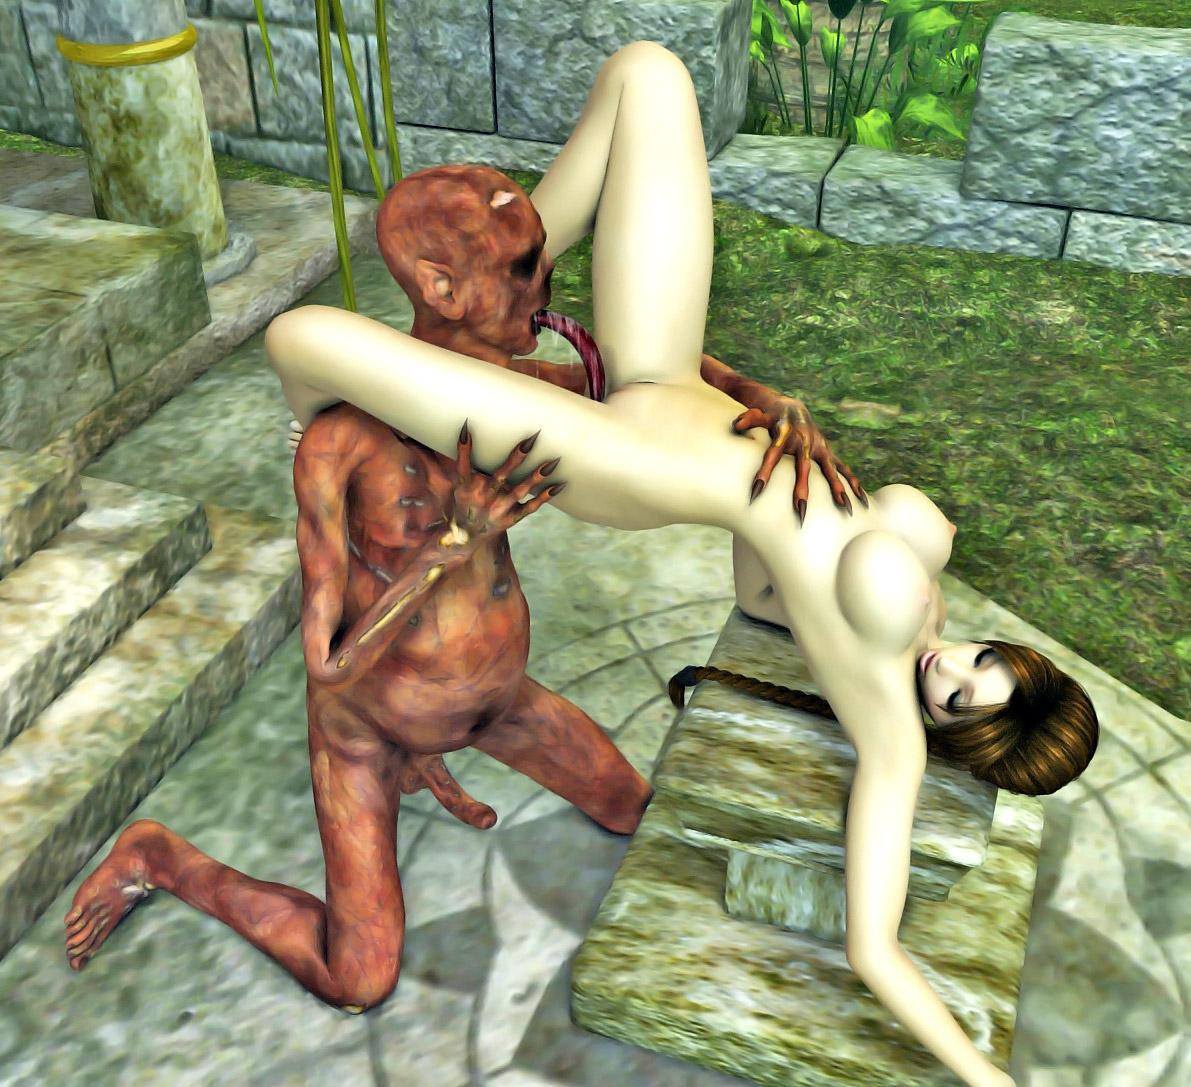 Busty raider porn game walkthrough fucks movies